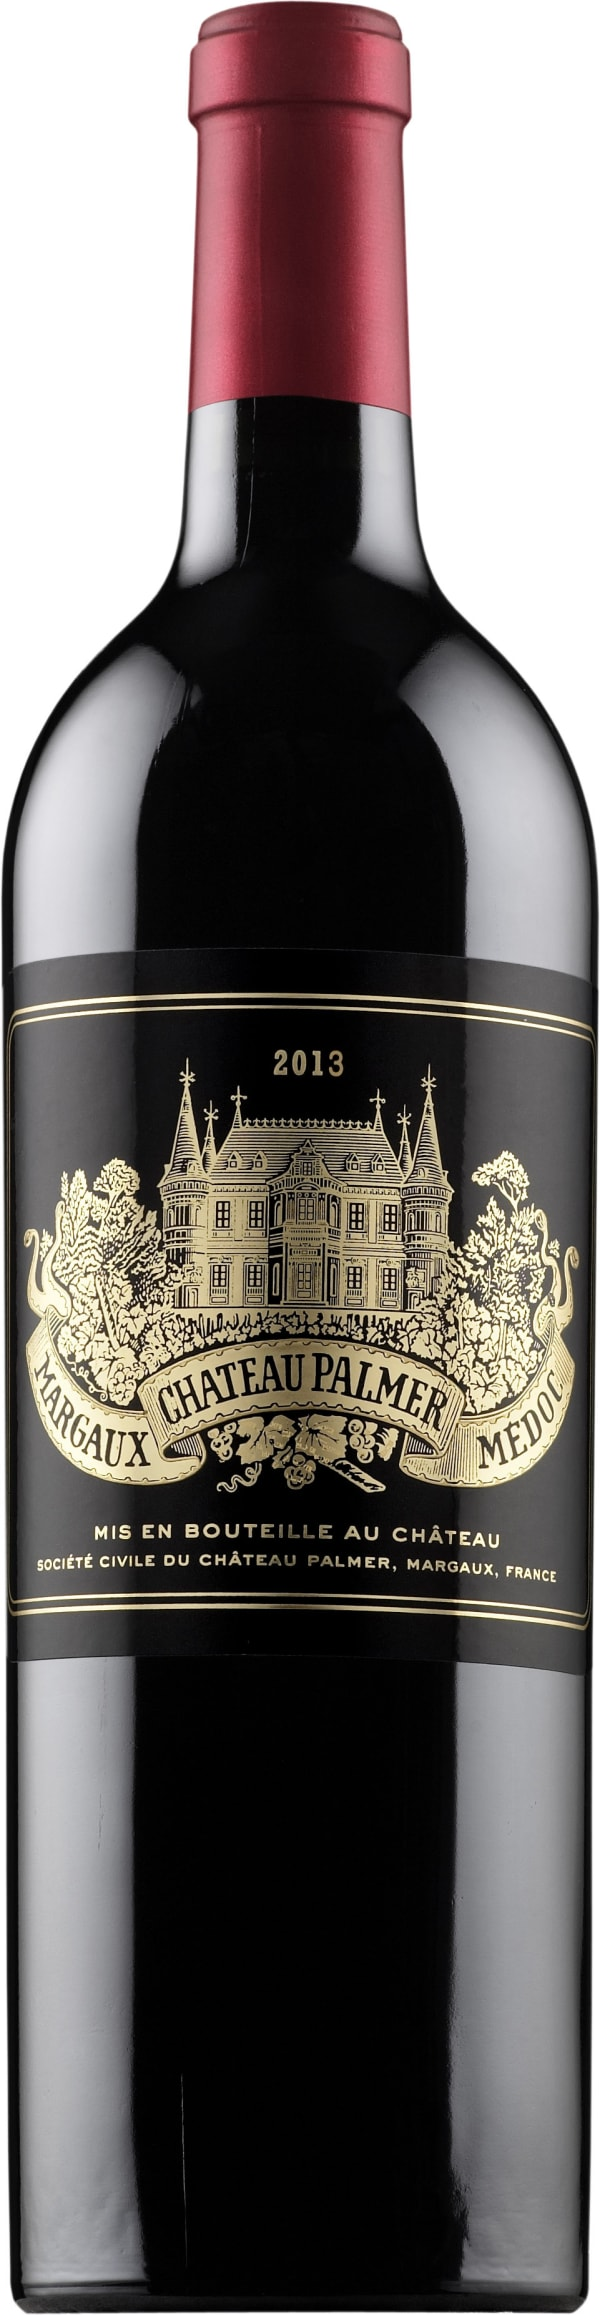 Château Palmer 2013